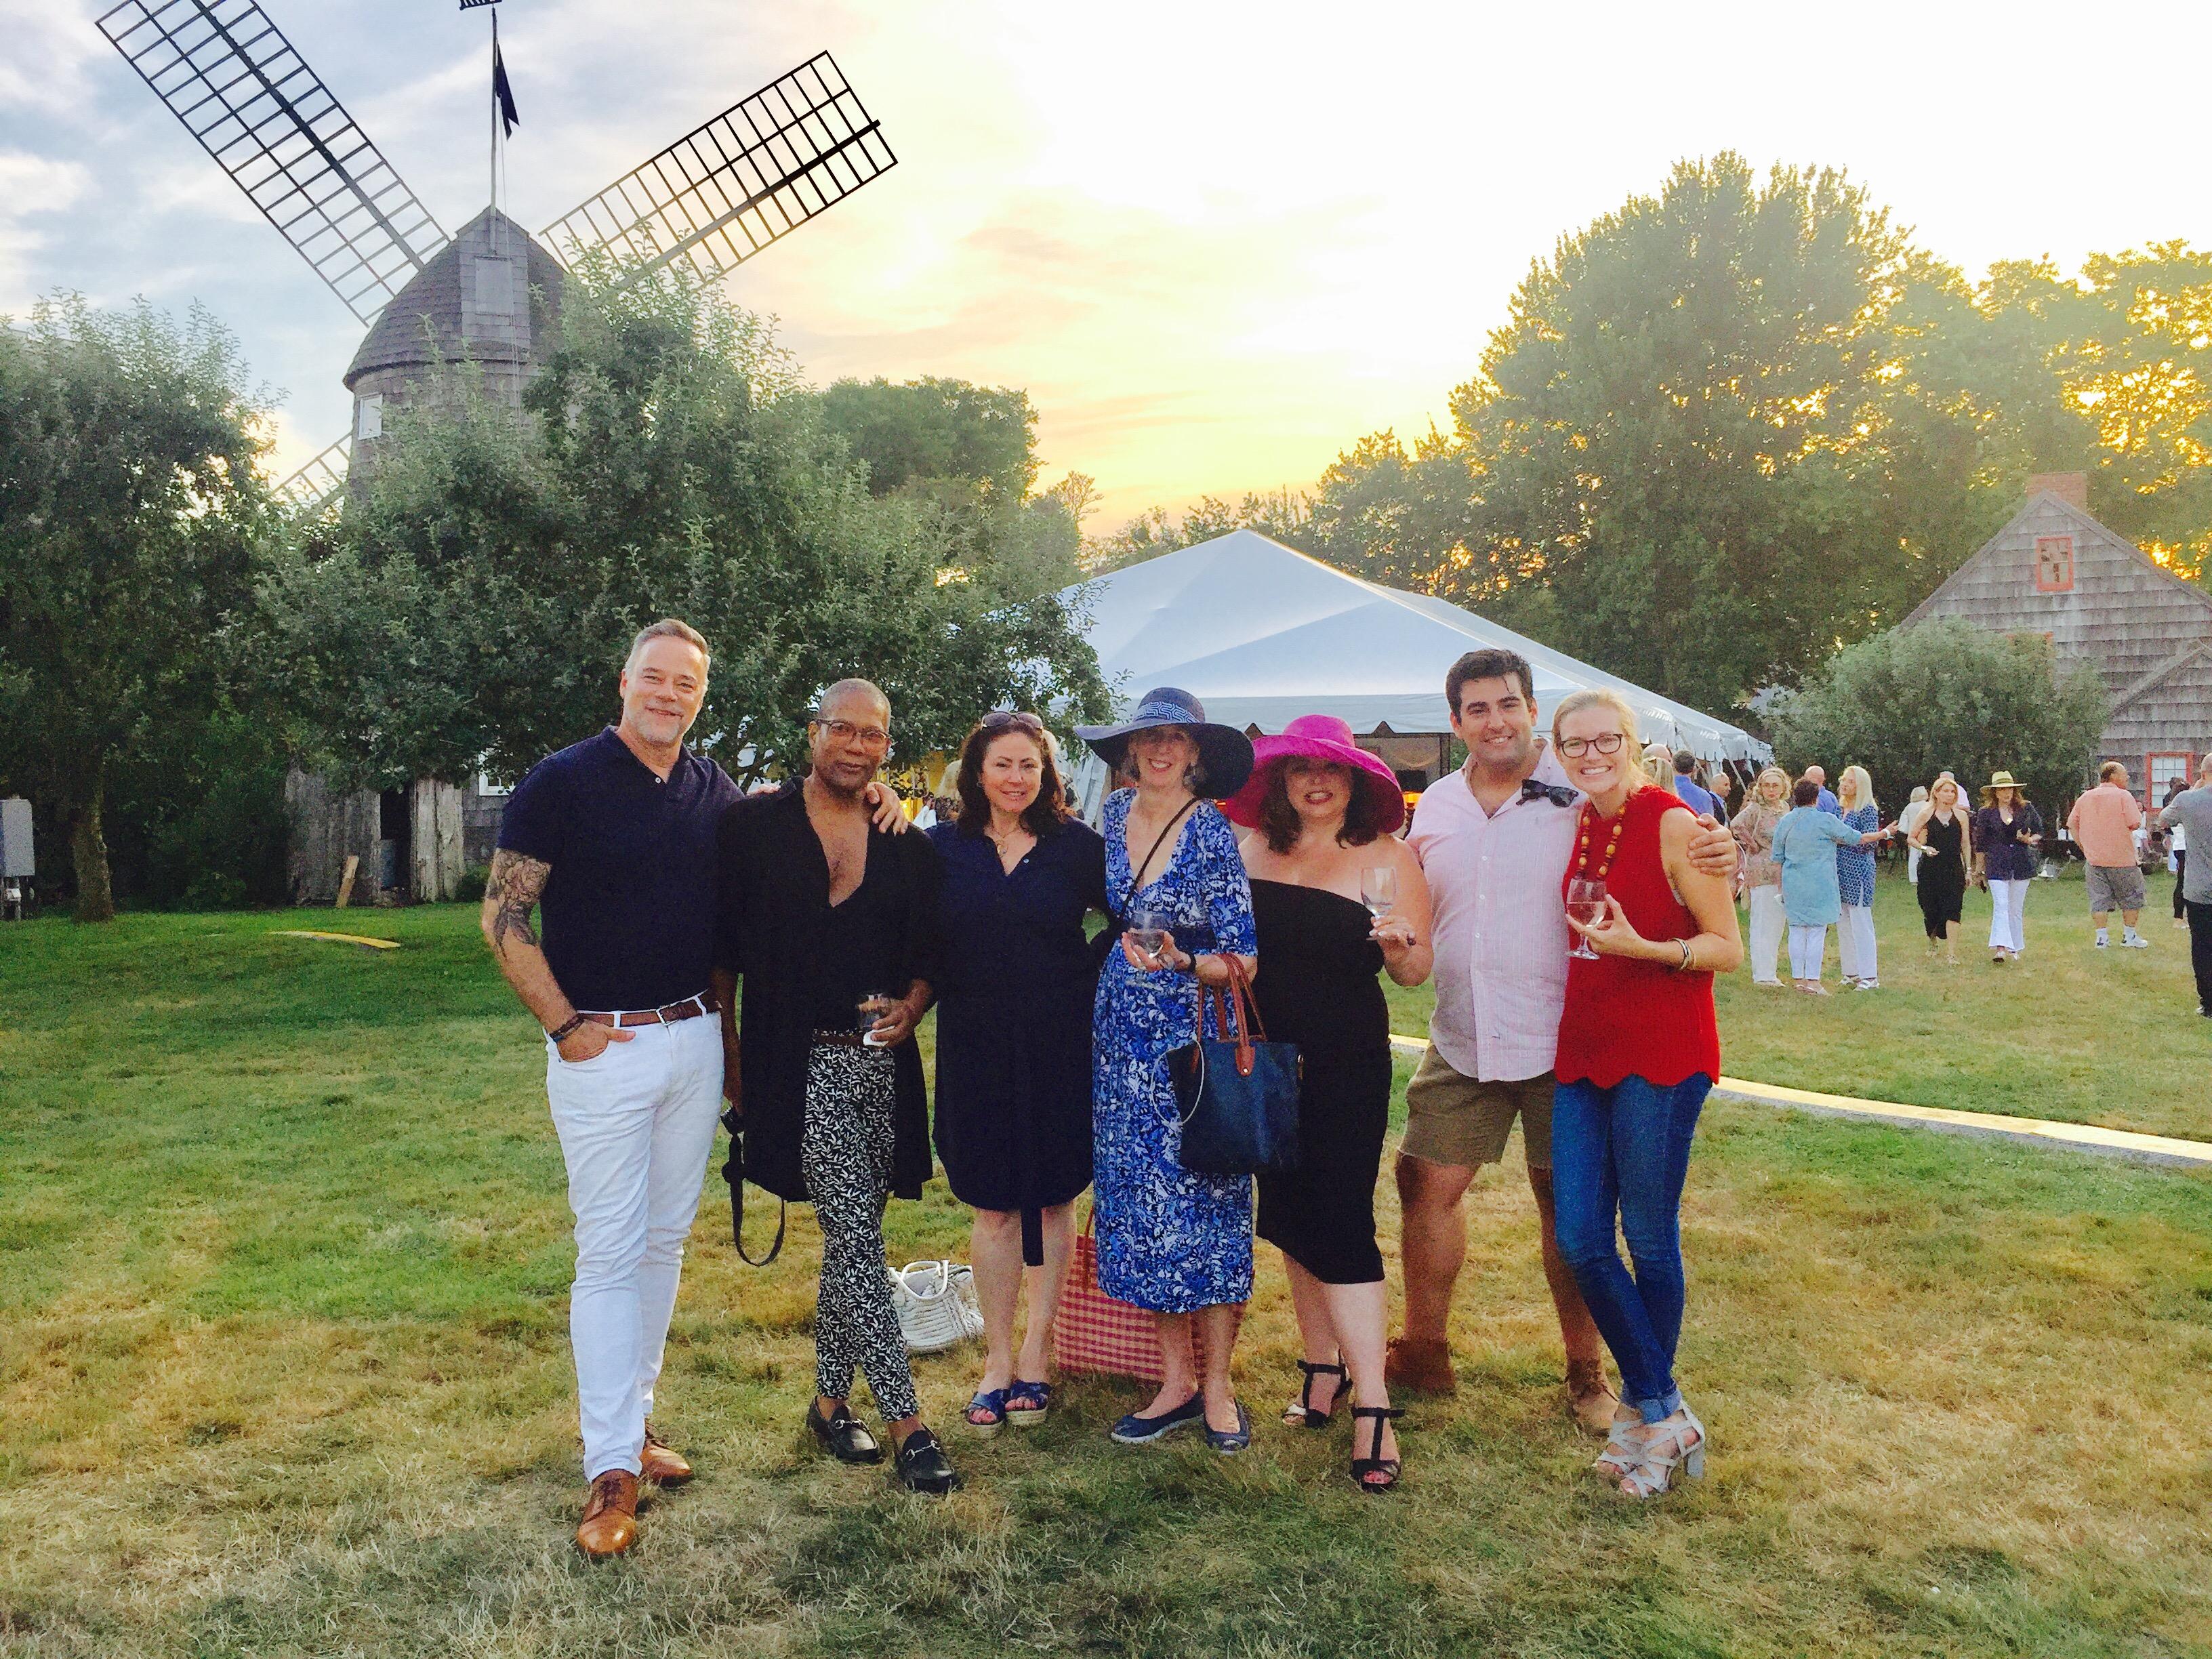 Antiques Diva Hamptons Antiques & Design Tour - East Hamptons Antiques Show 2017